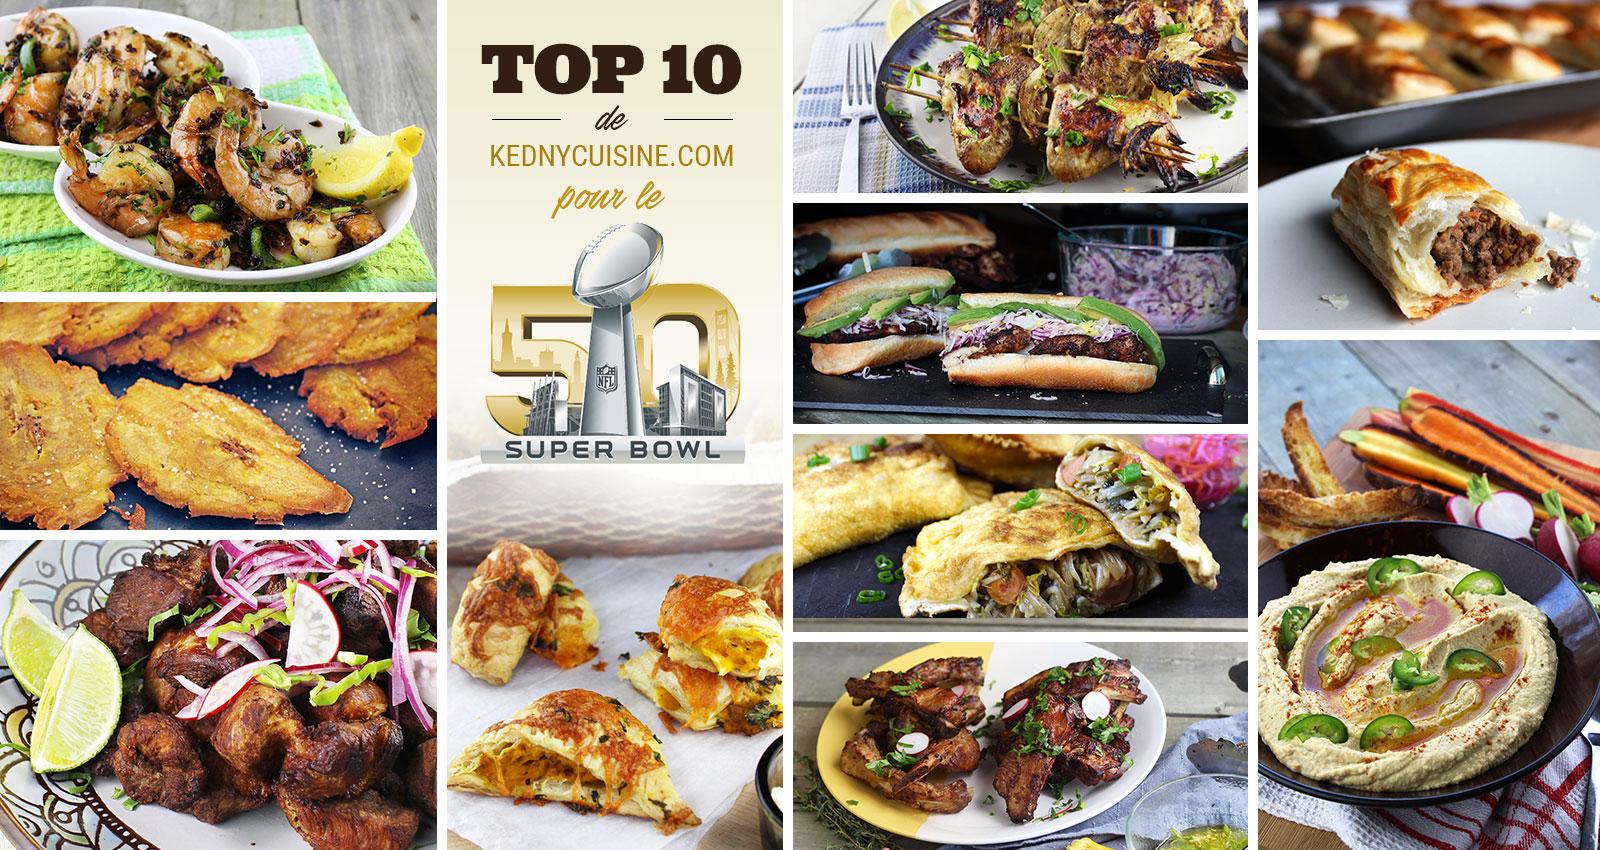 Super Bowl 50 - Kedny Cuisine